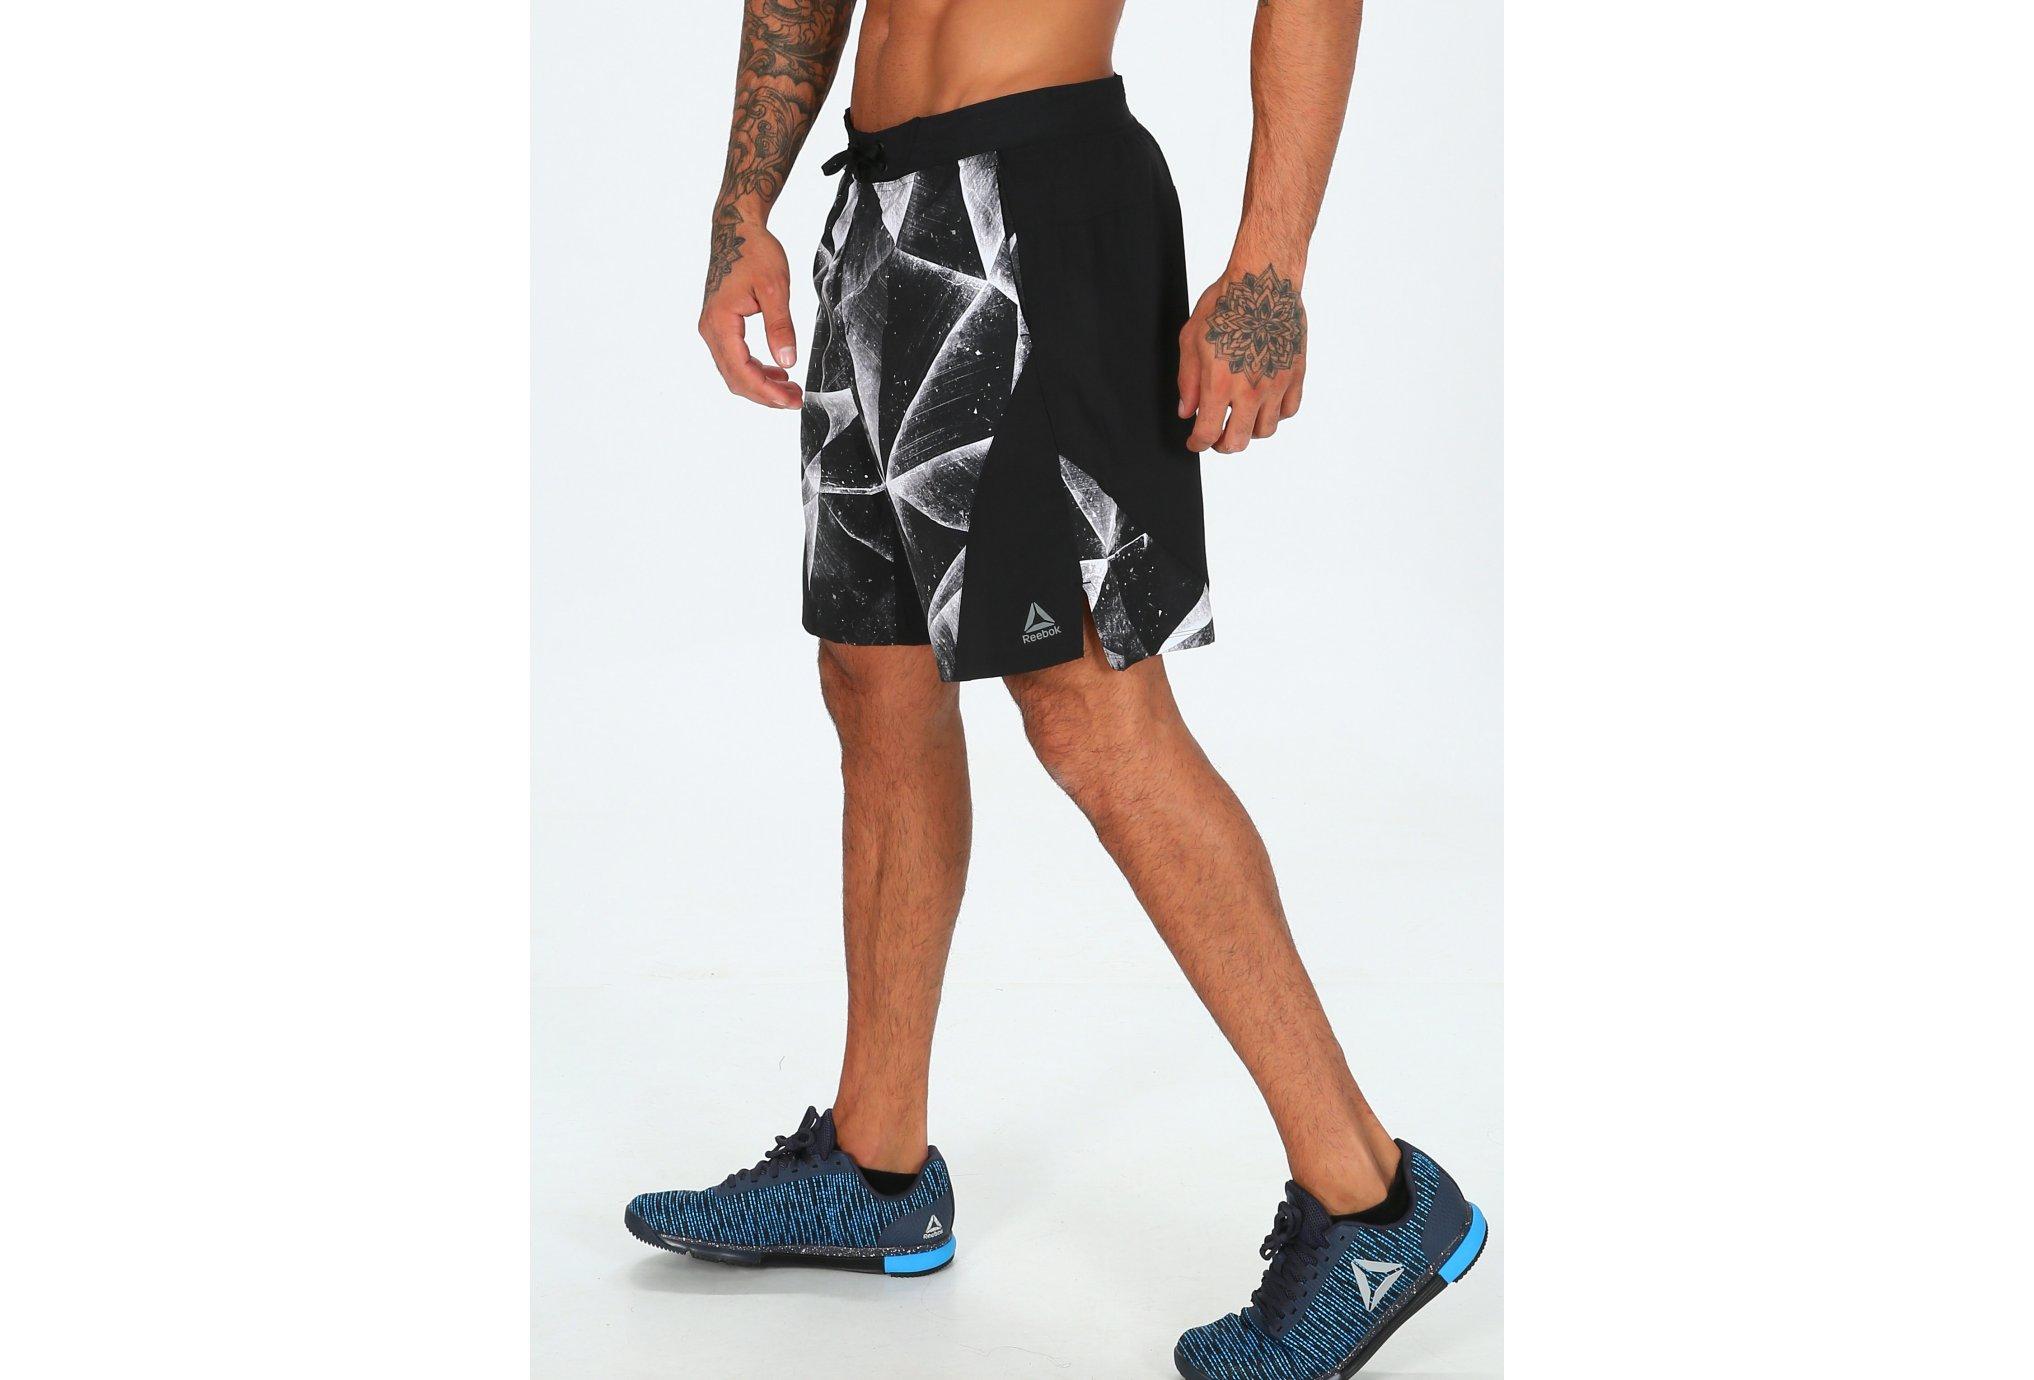 Reebok One Series Epic M vêtement running homme